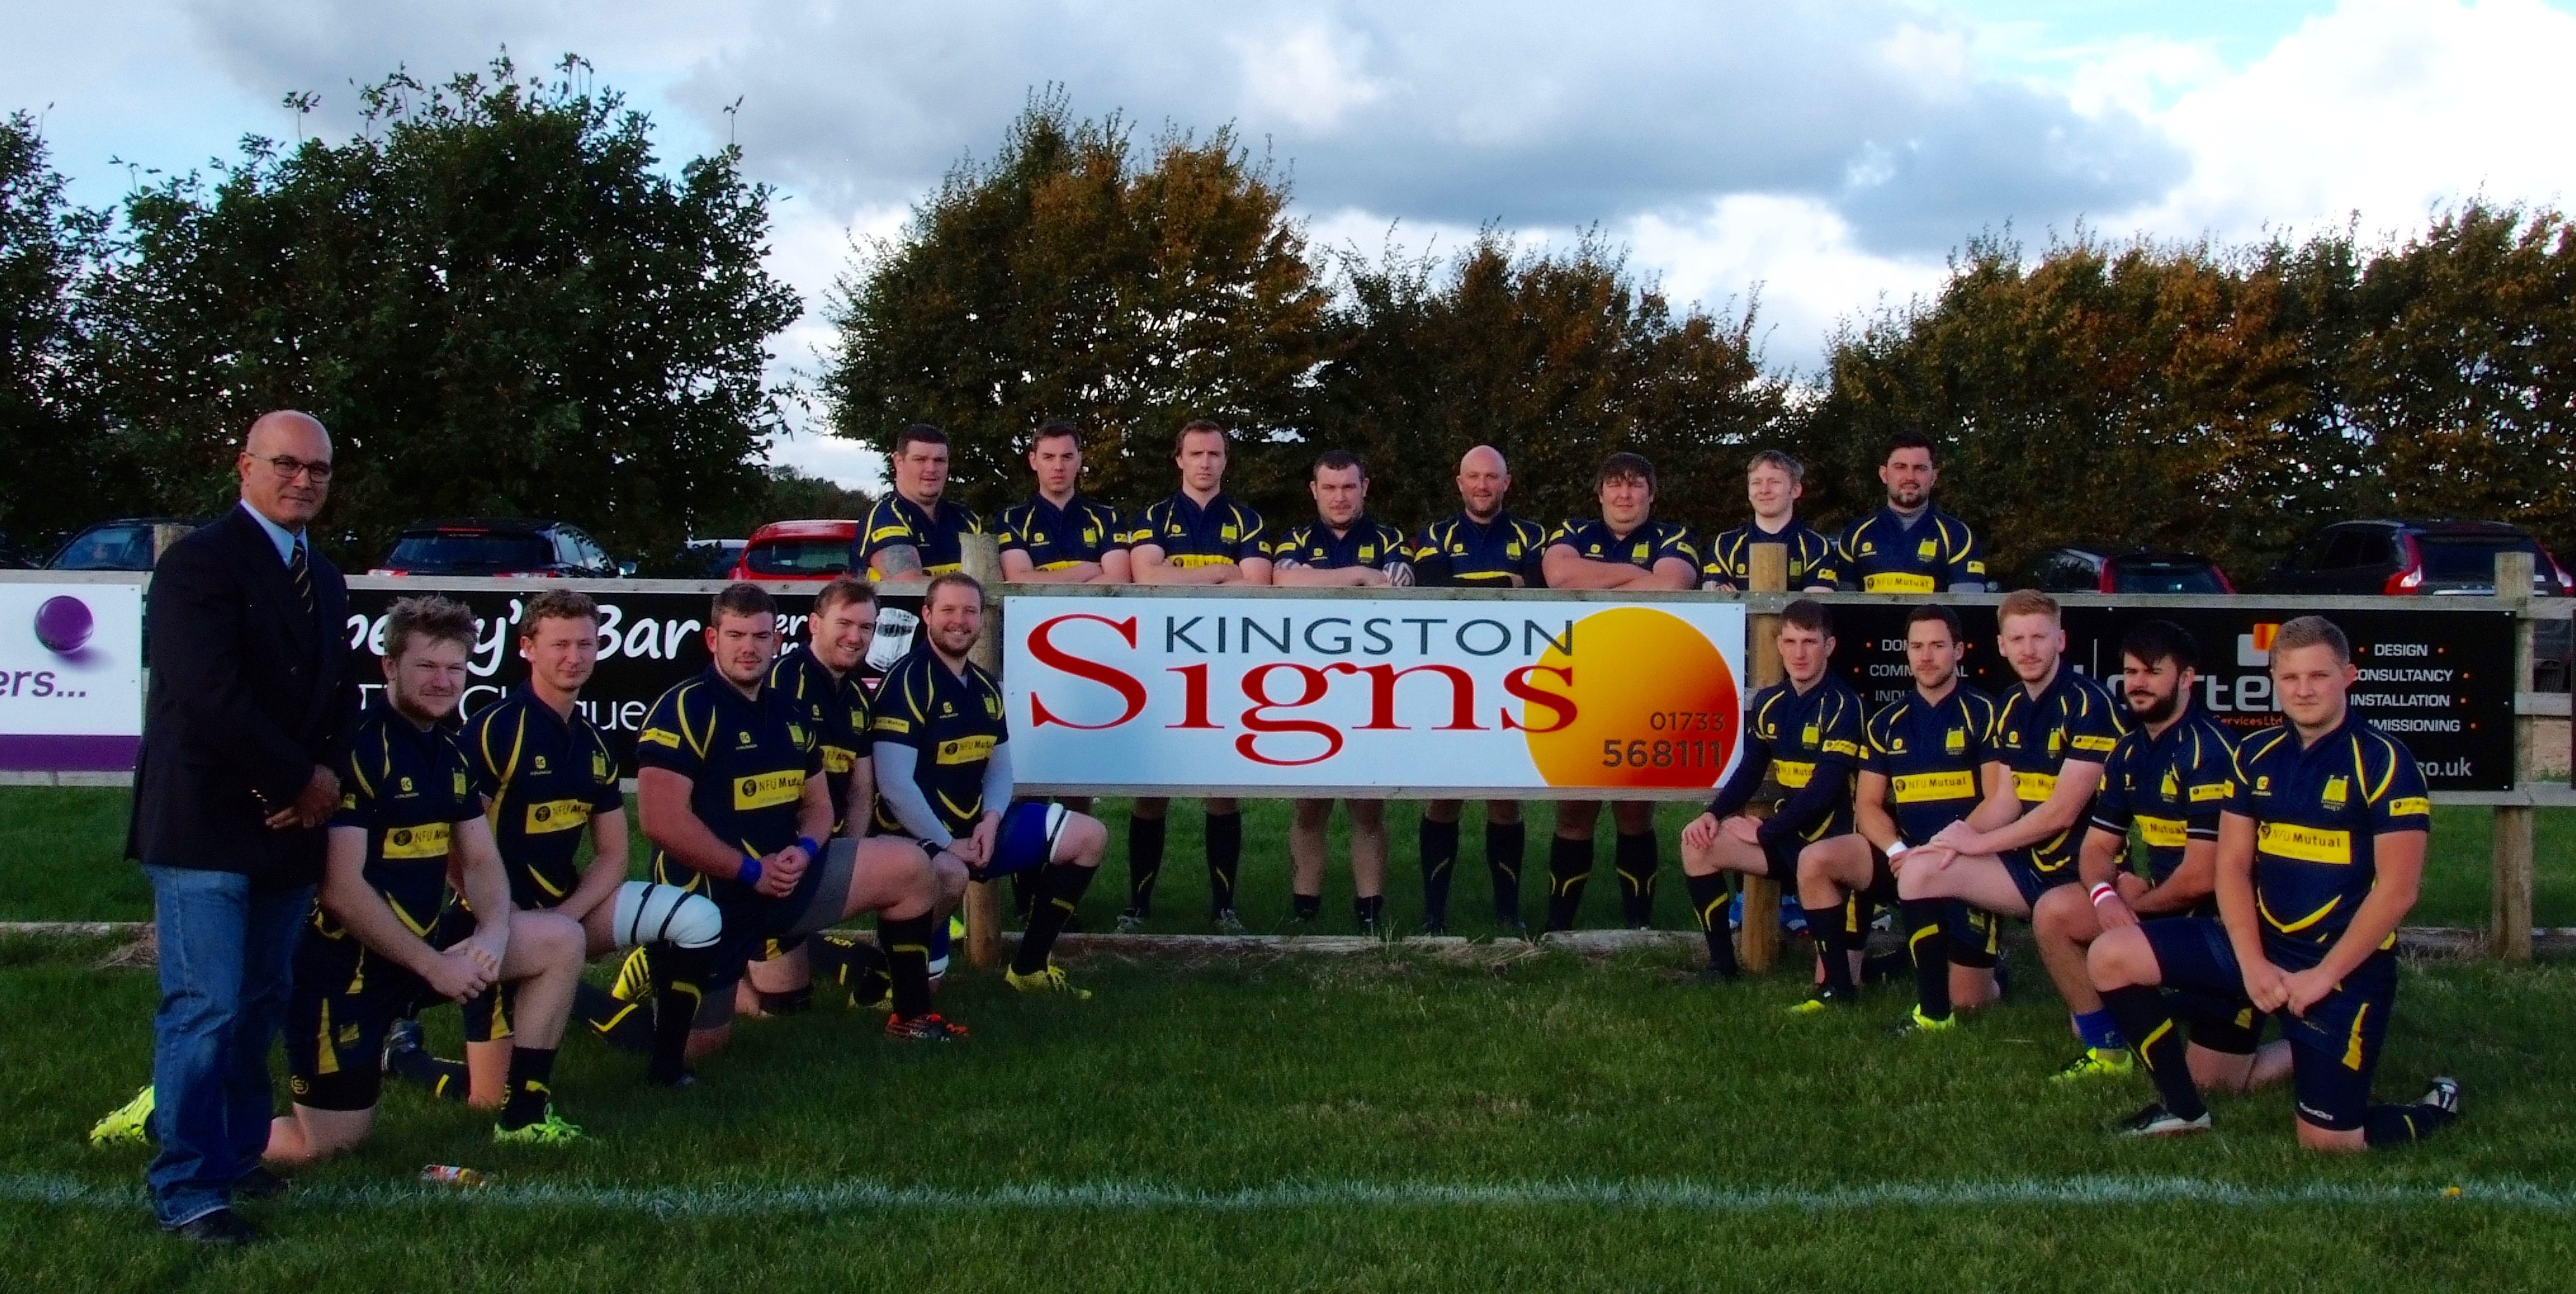 Kingston Signs